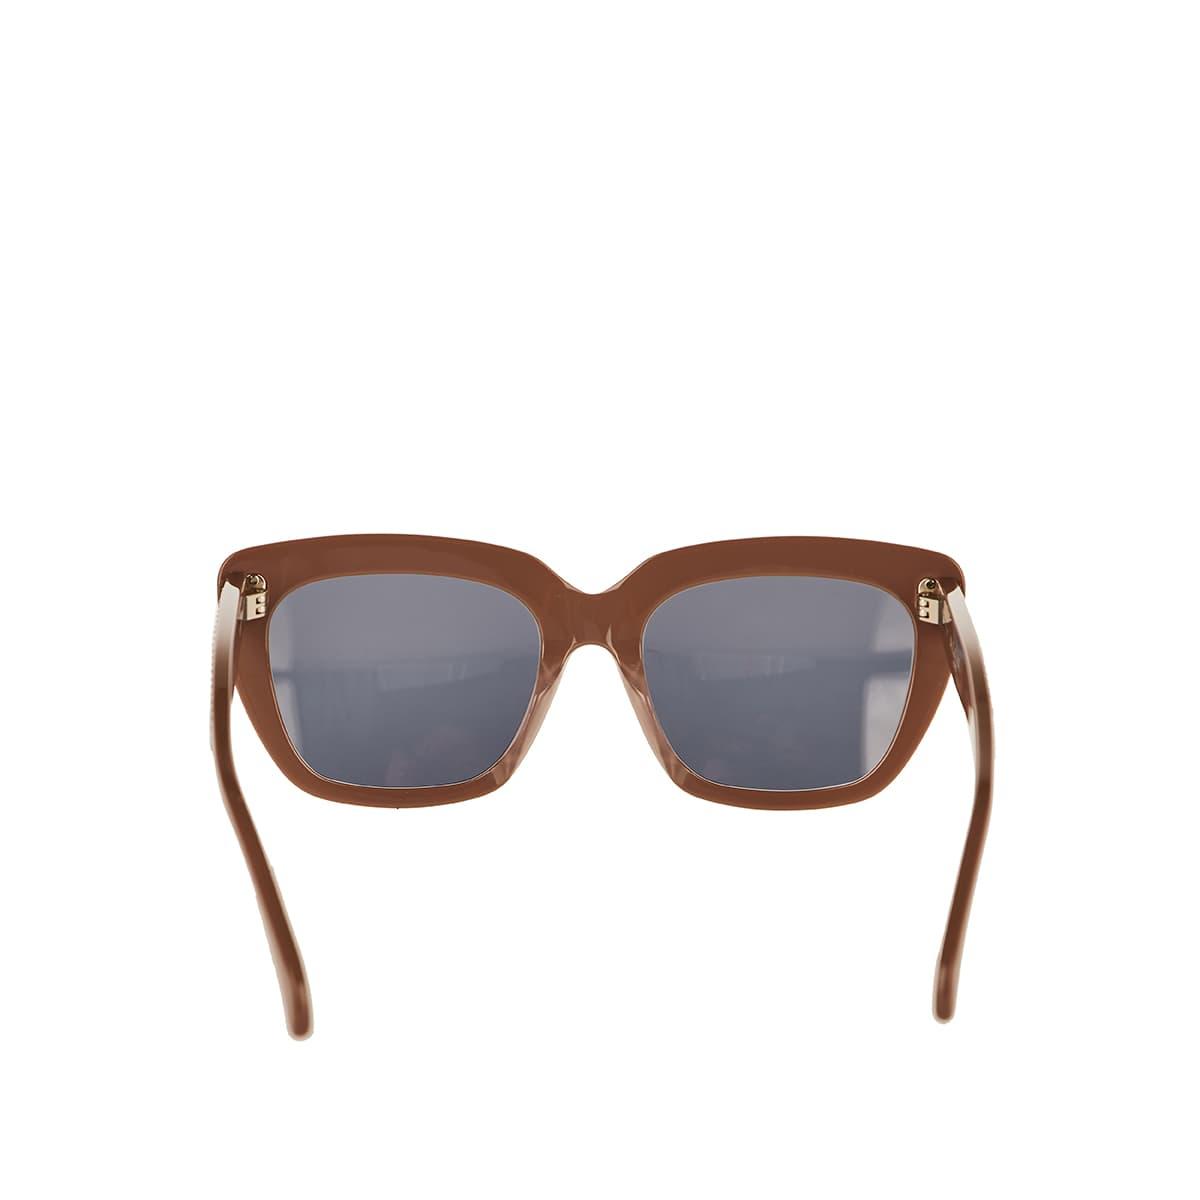 Studded square sunglasses